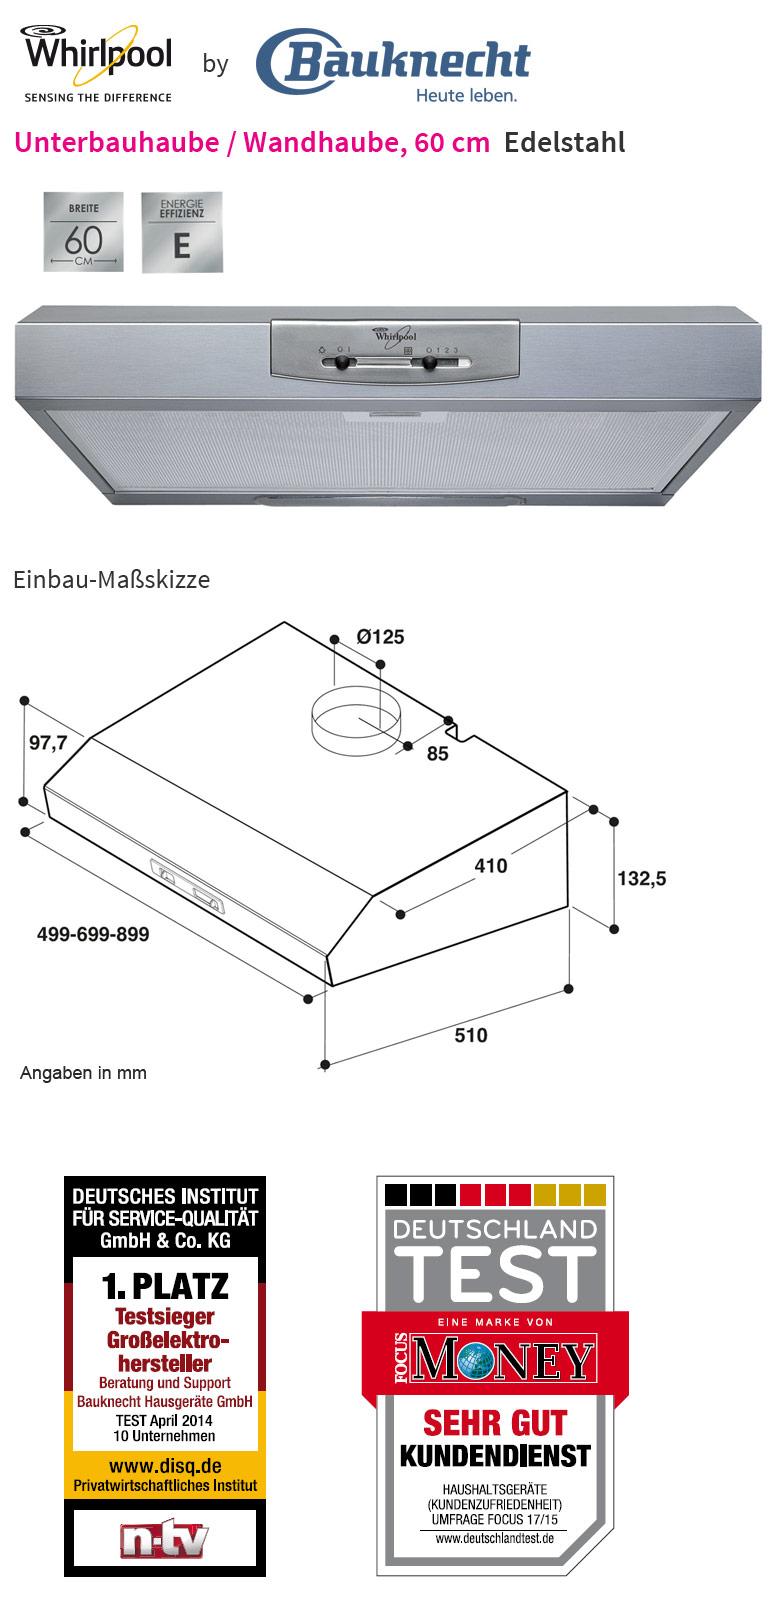 whirlpool akr 400 ix edelstahl 60 cm unterbau dunstabzugshaube unterbauhaube neu. Black Bedroom Furniture Sets. Home Design Ideas